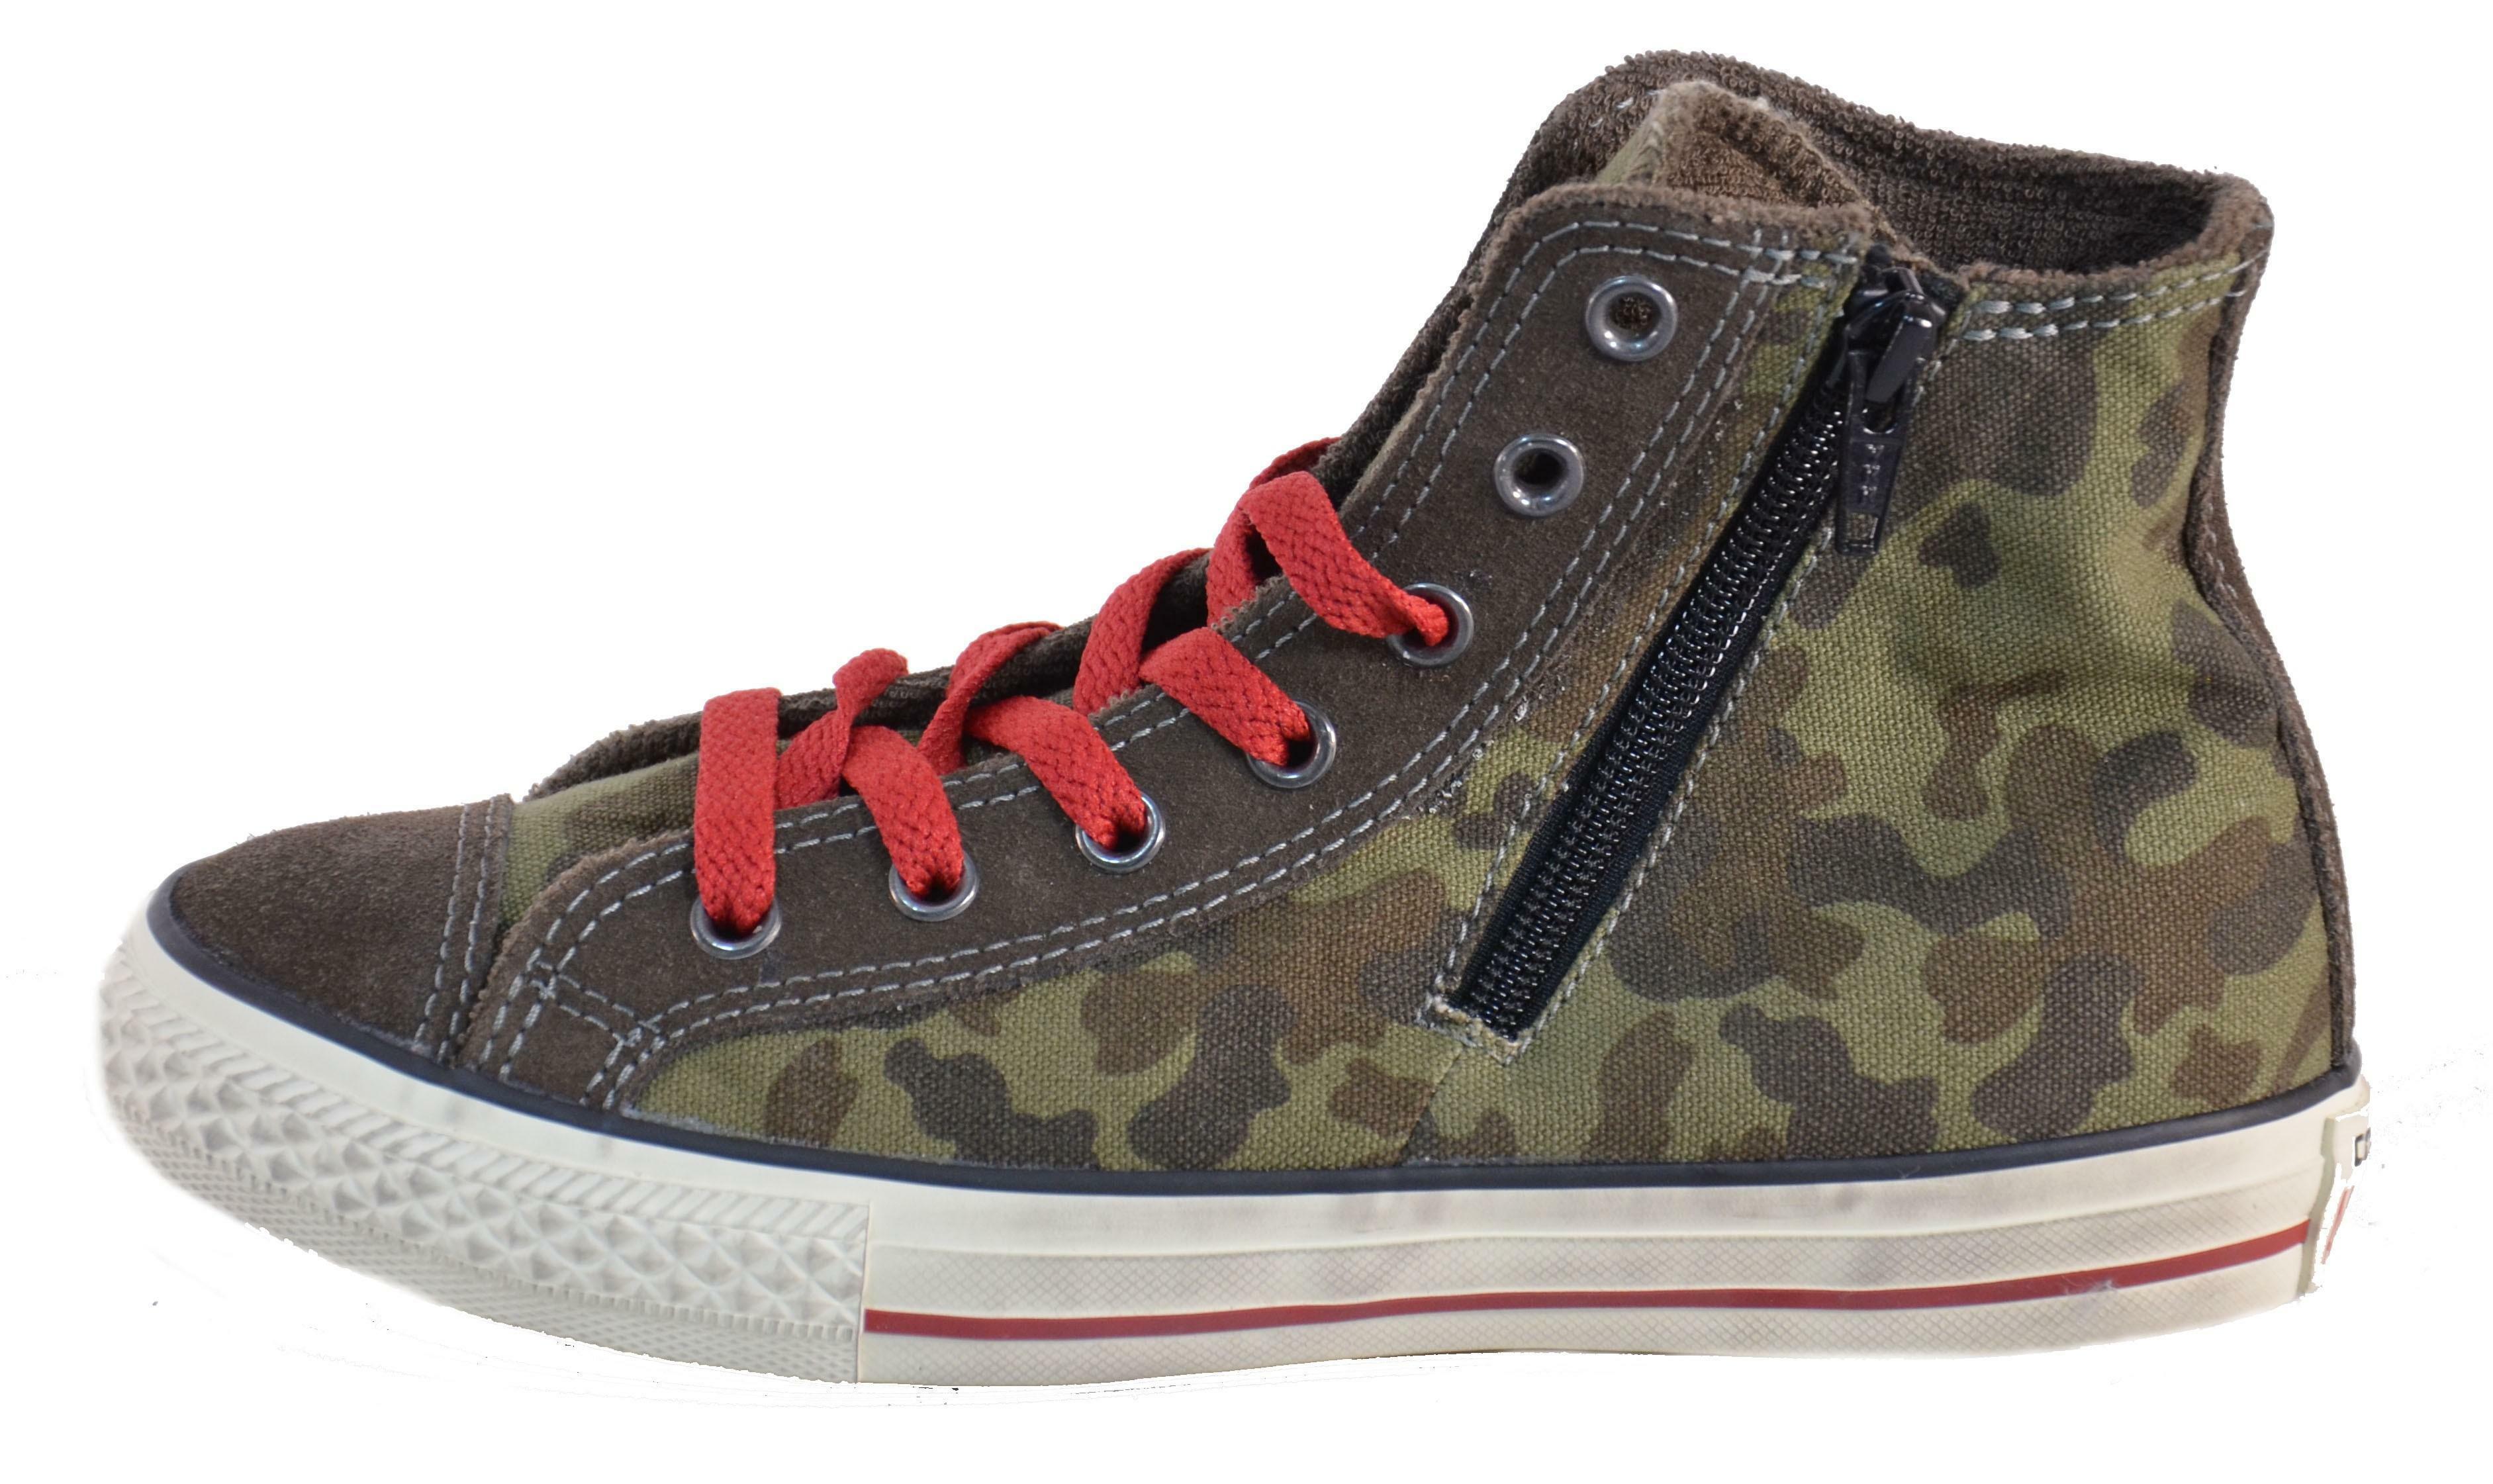 converse converse all star ct side zip scarpa verde lacci zip 641234c